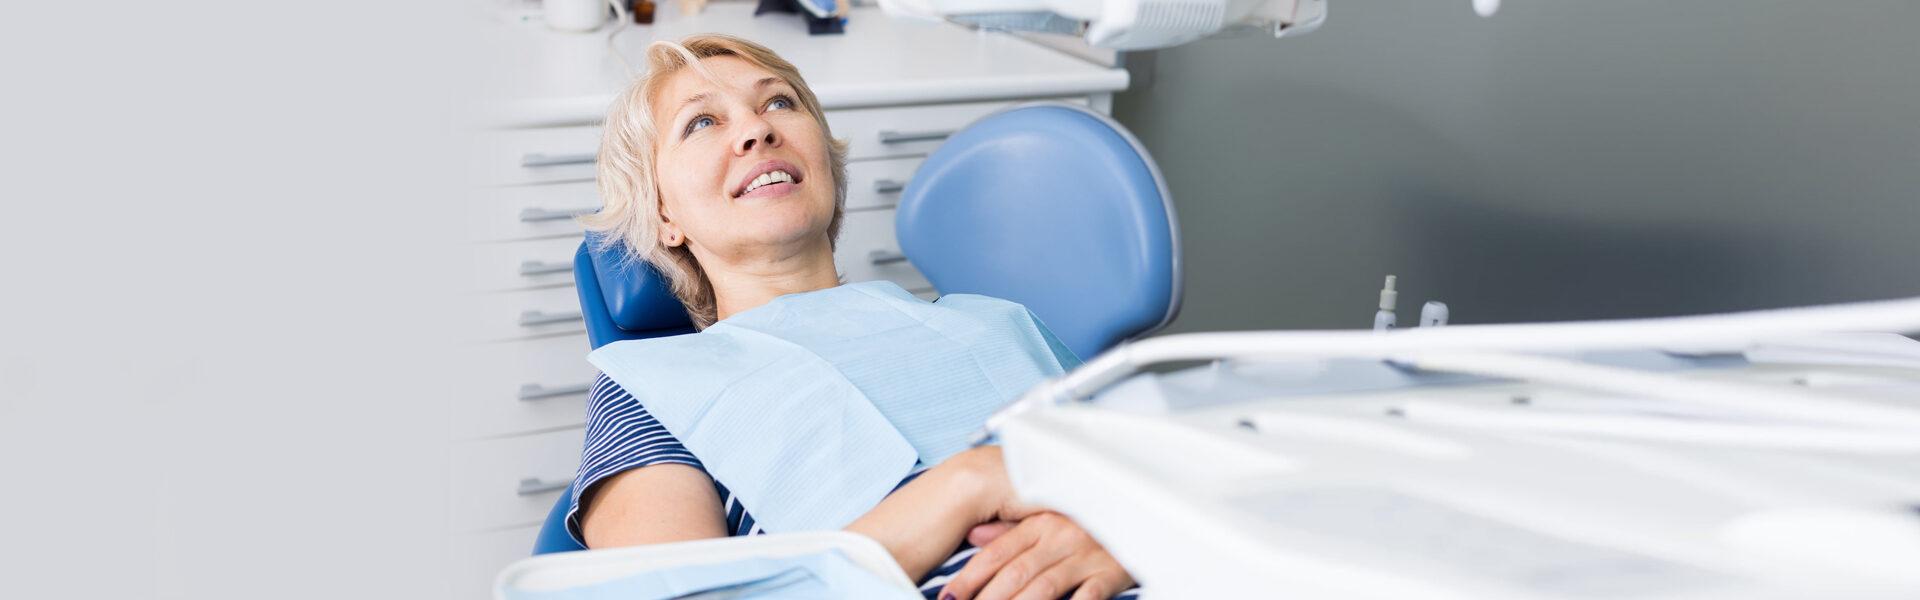 Periodontal Treatment in Westwood, MA